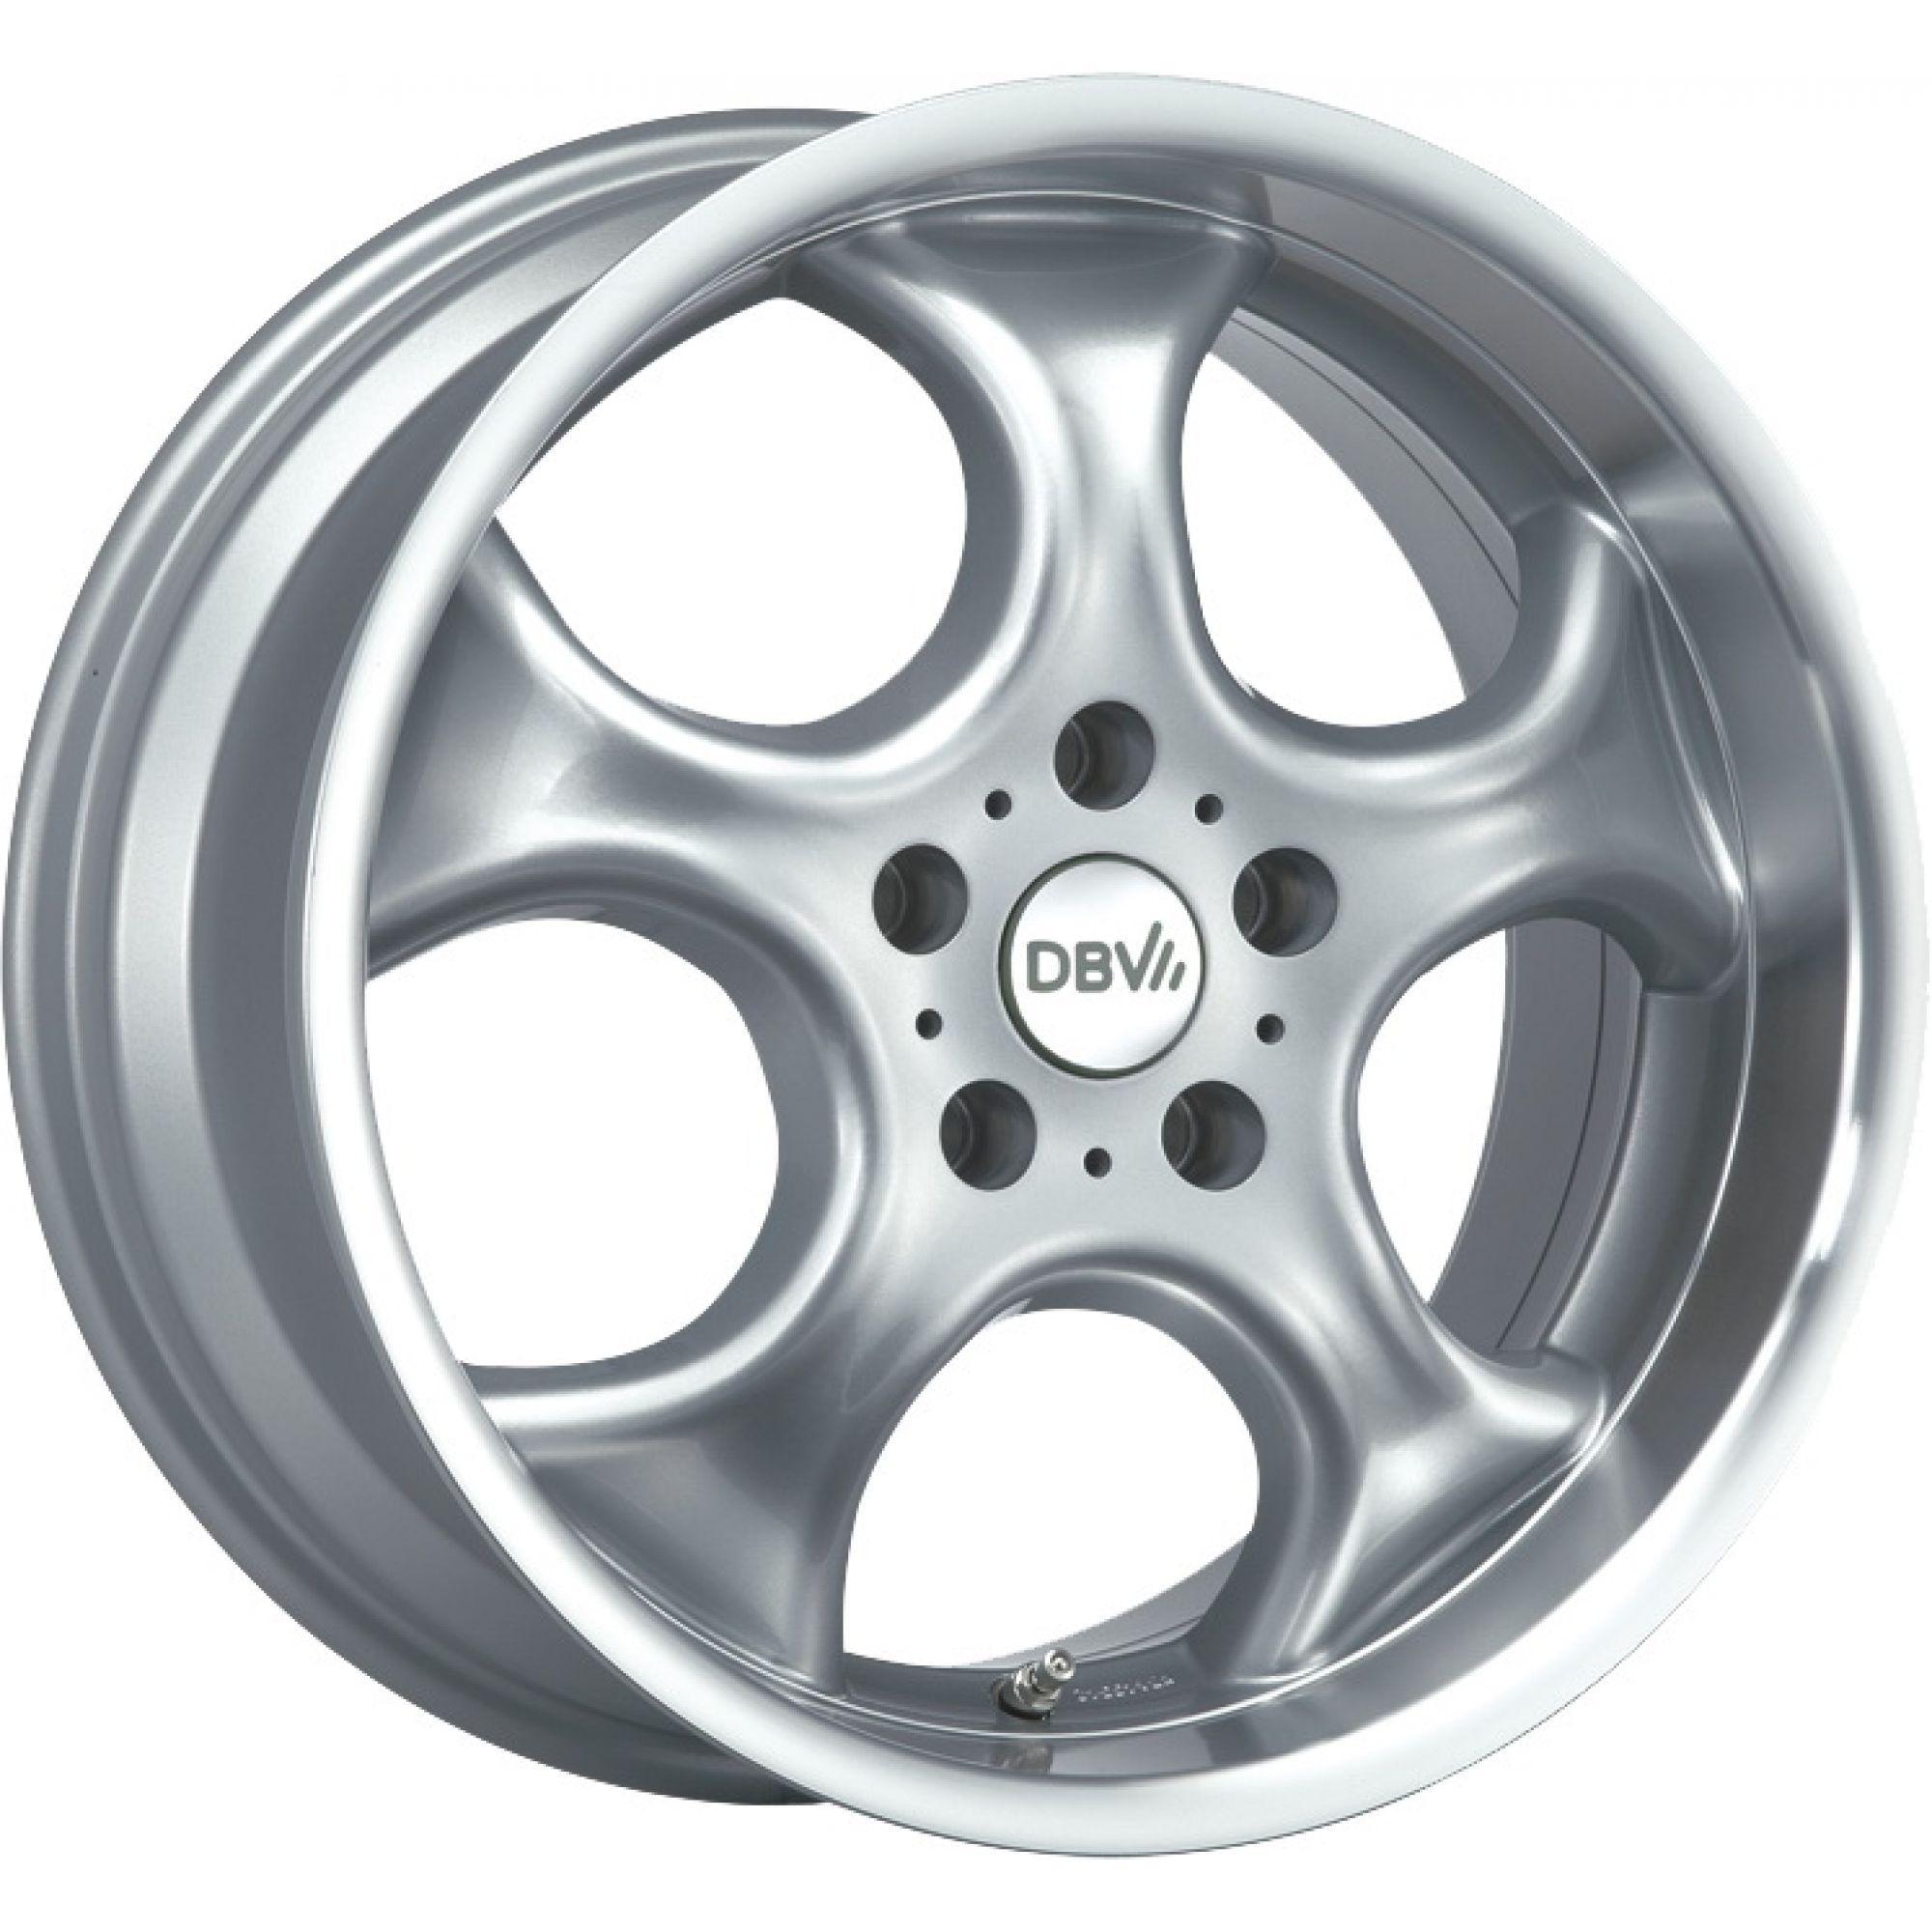 DBV Tahiti brilliant silver painted alloy wheel 5.5xR13 PCD 4x100 ET38 d63.30